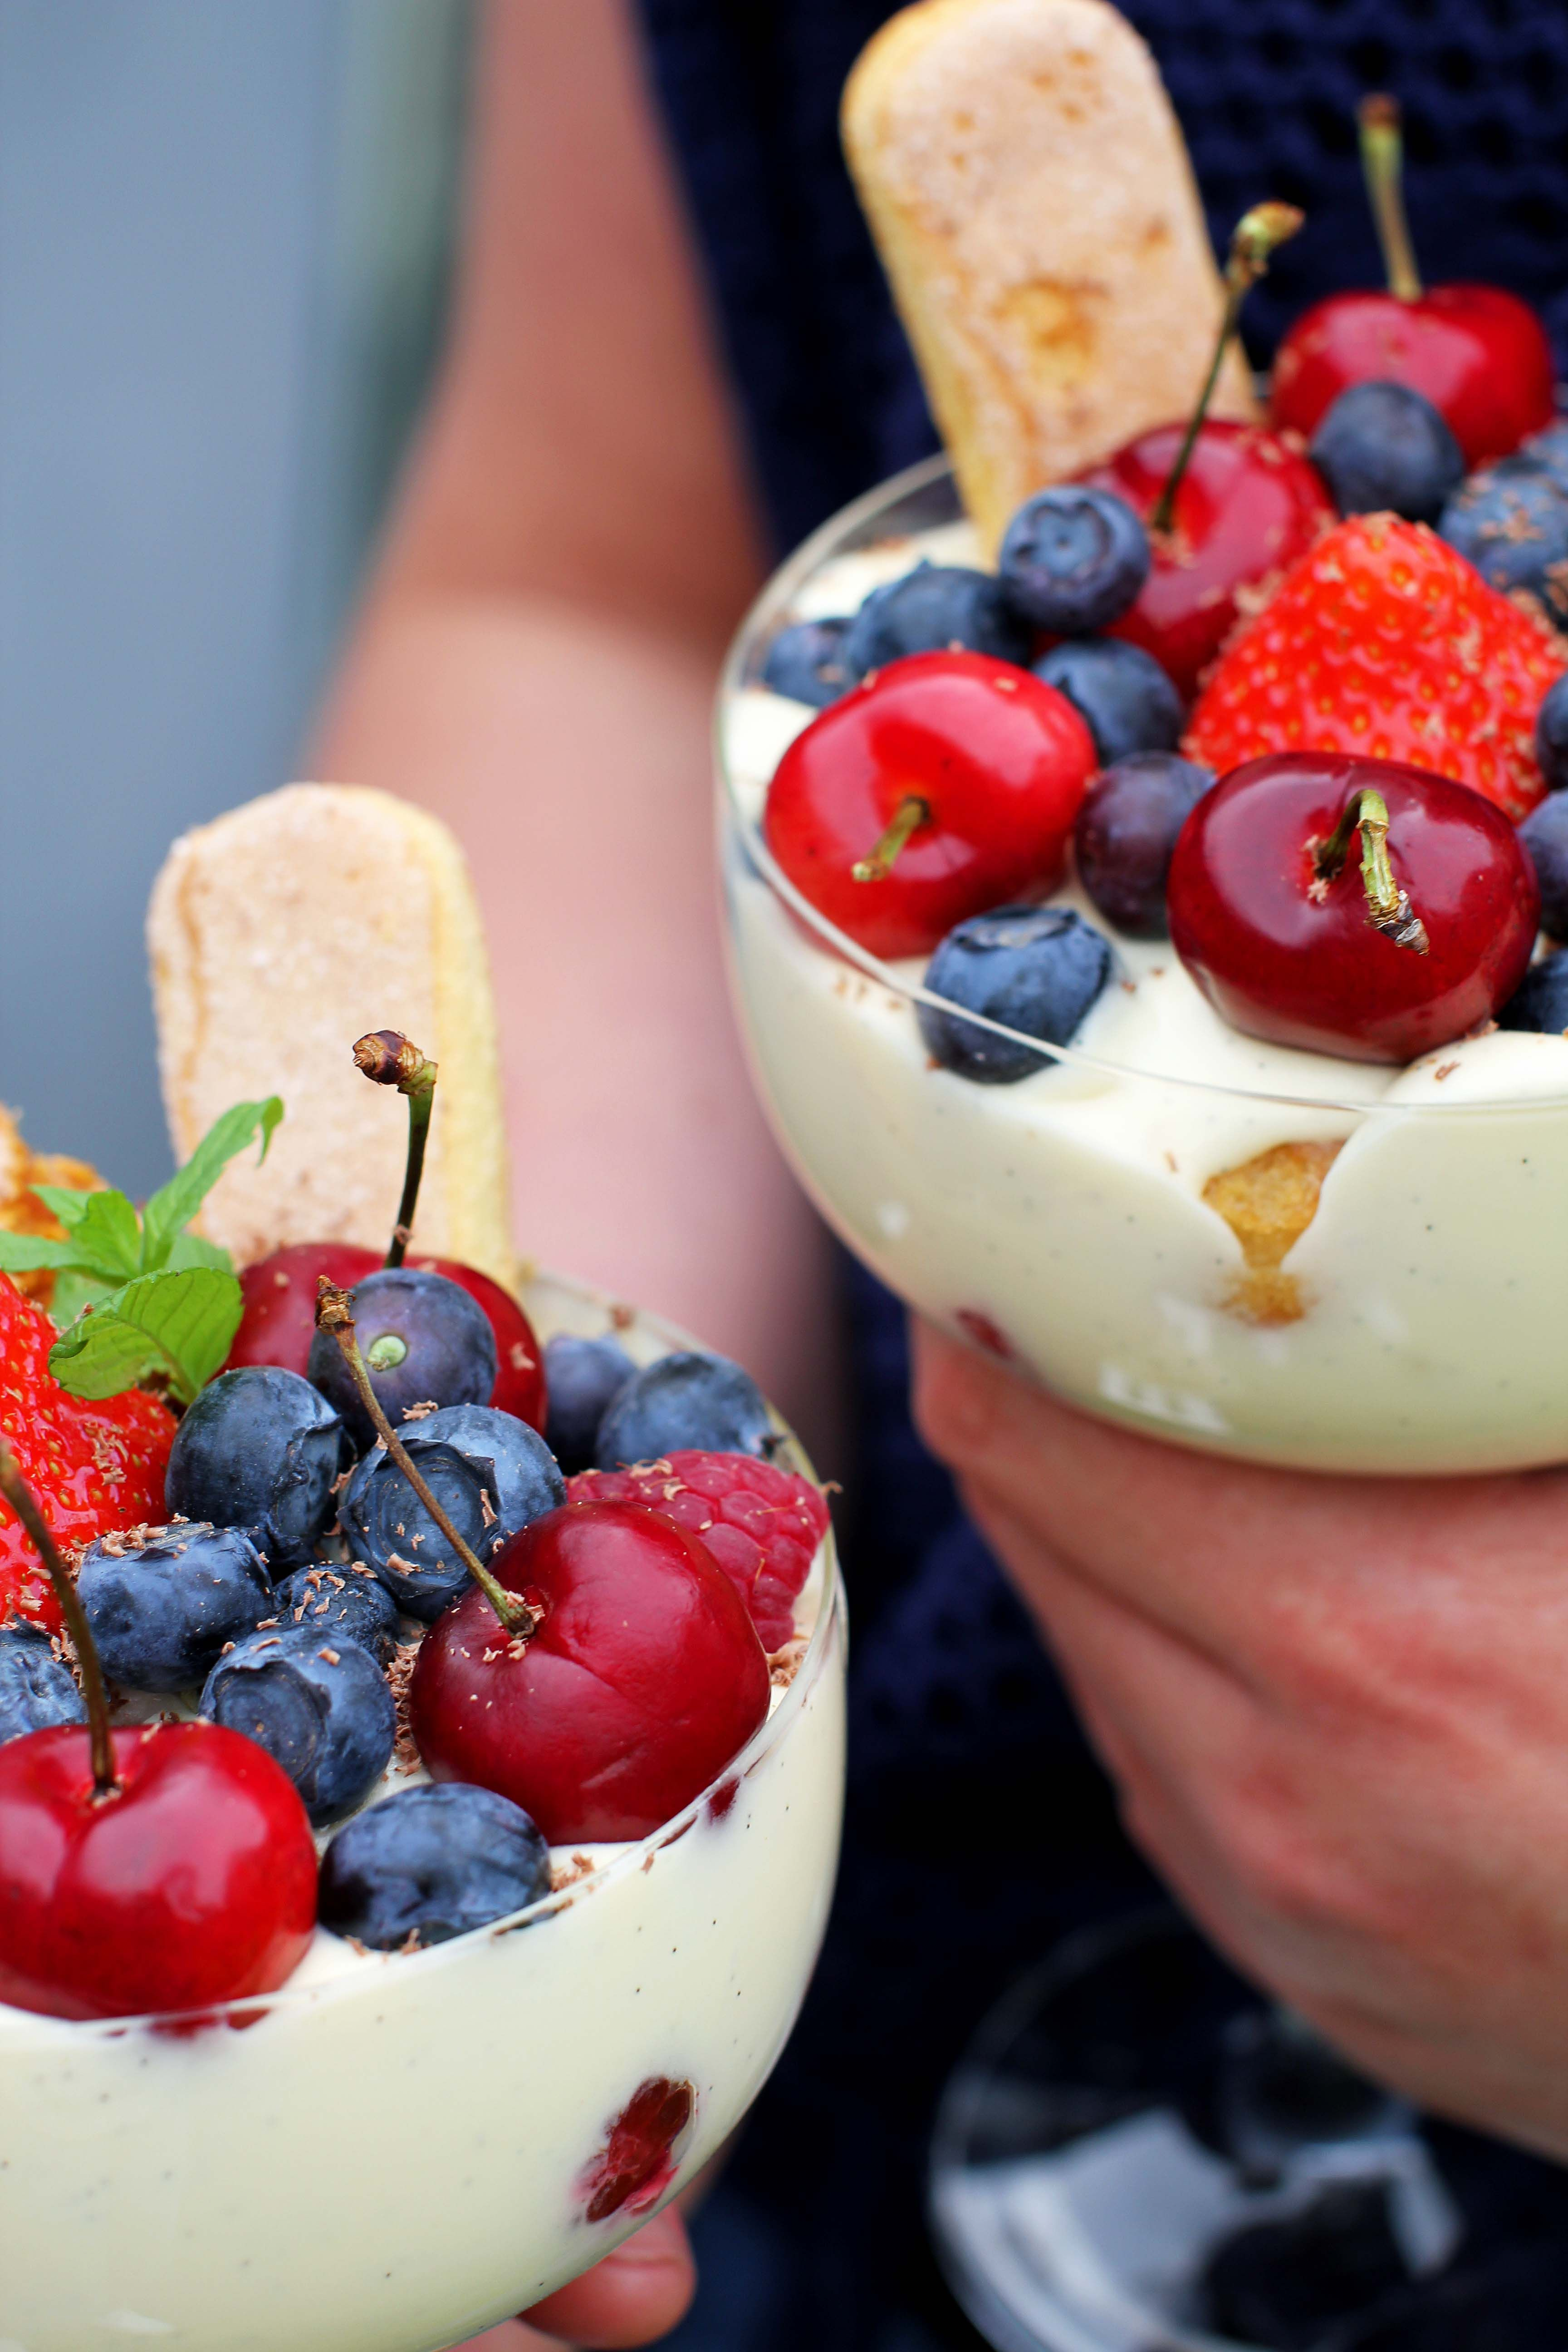 The Perfect Summer Dessert Rose Wine Tiramisu With Fresh Fruit And Berries Wine Desserts Desserts Dessert Recipes